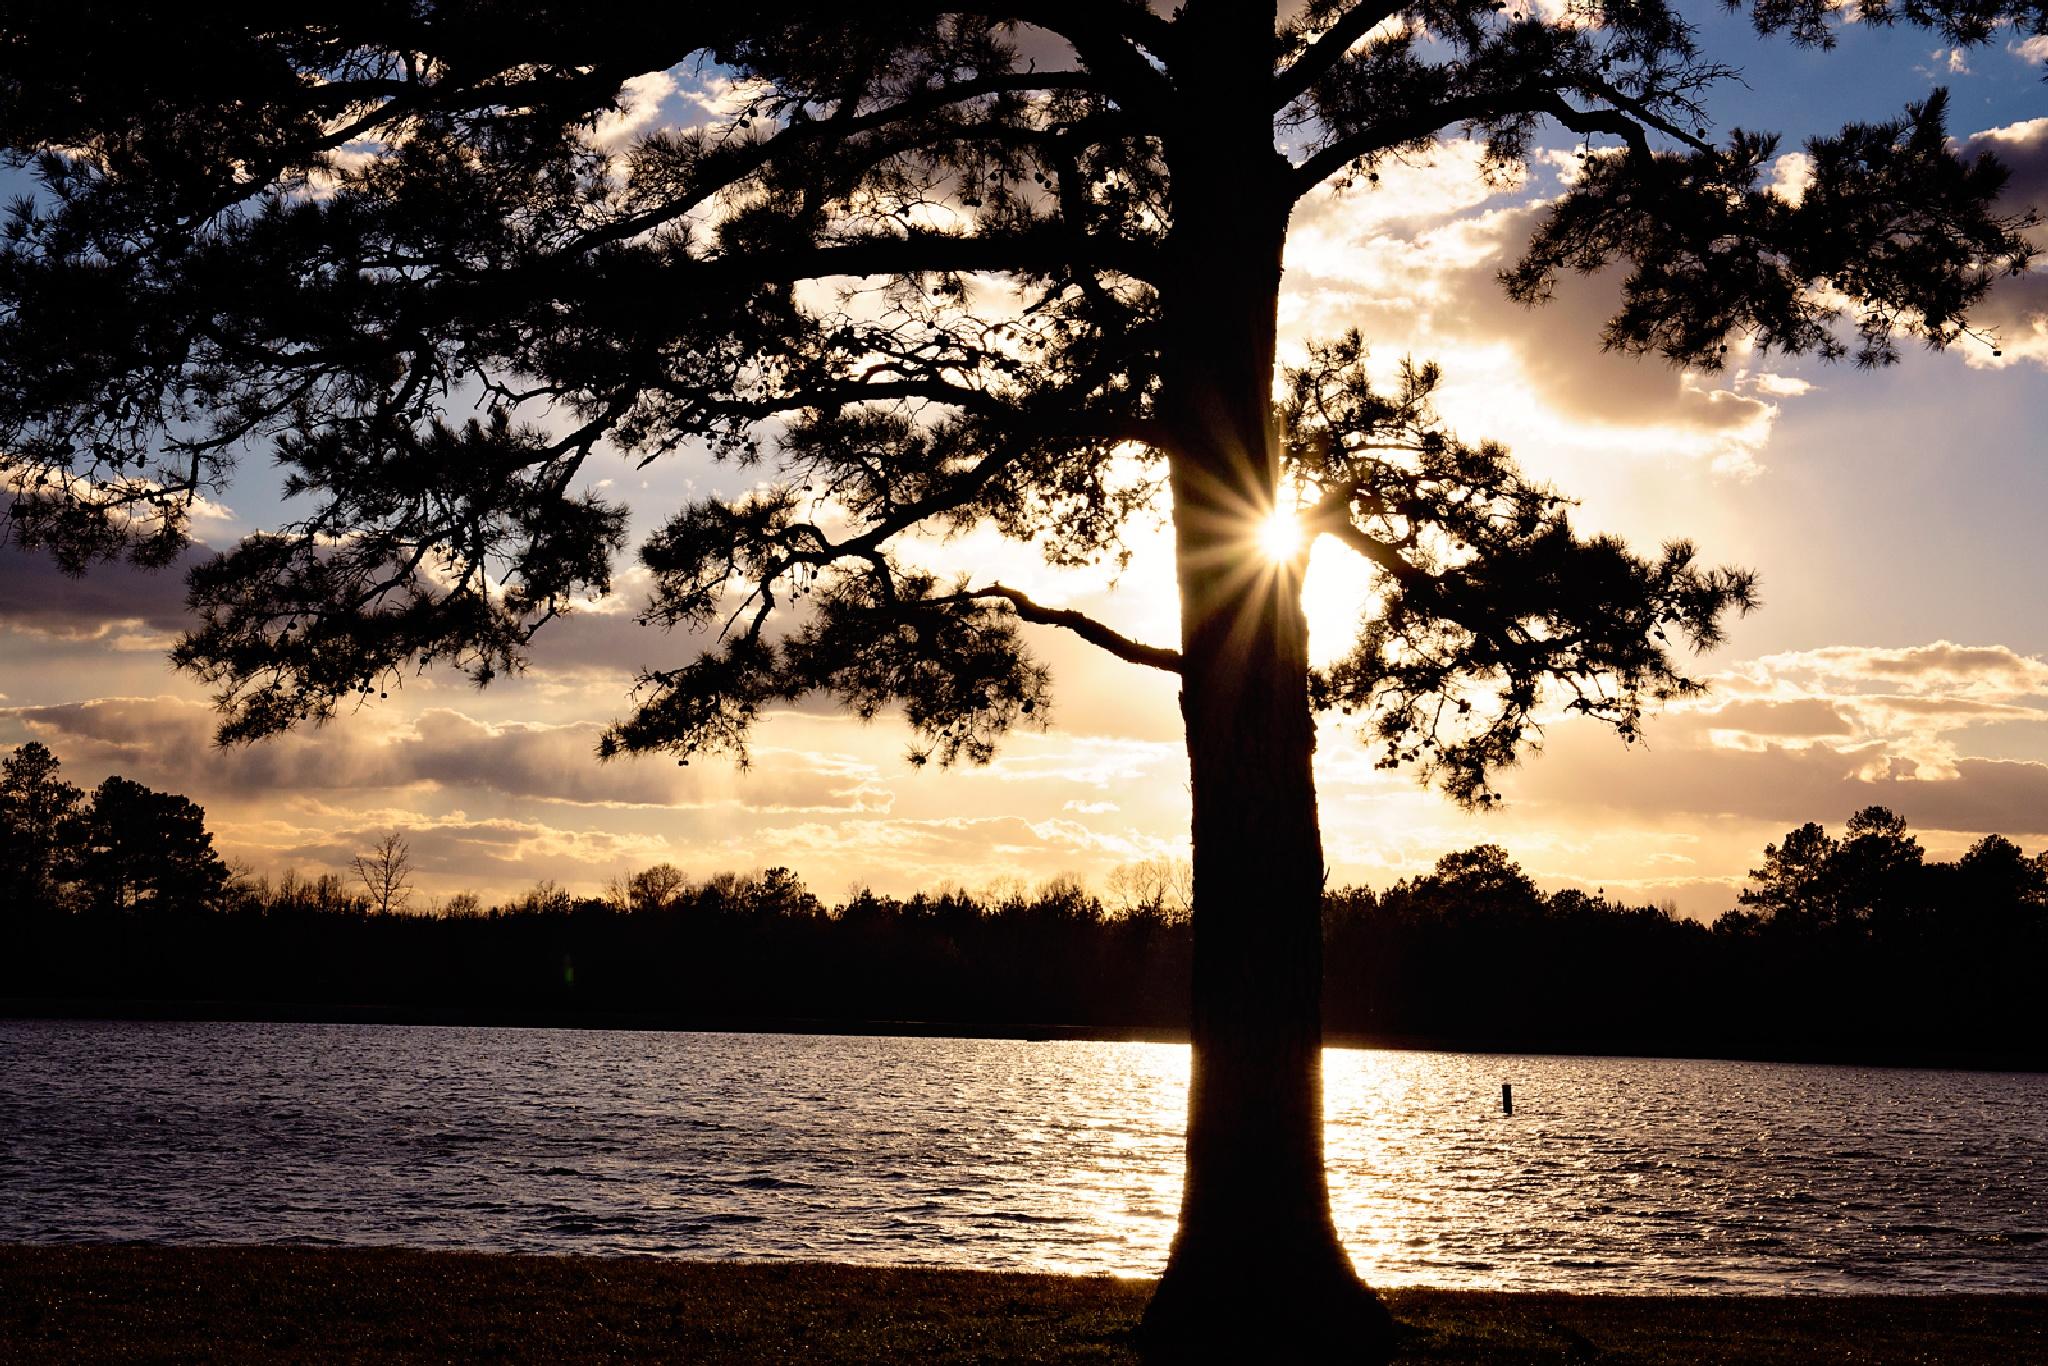 Lake Mike Conner, MS by jennifer.byrd.1238